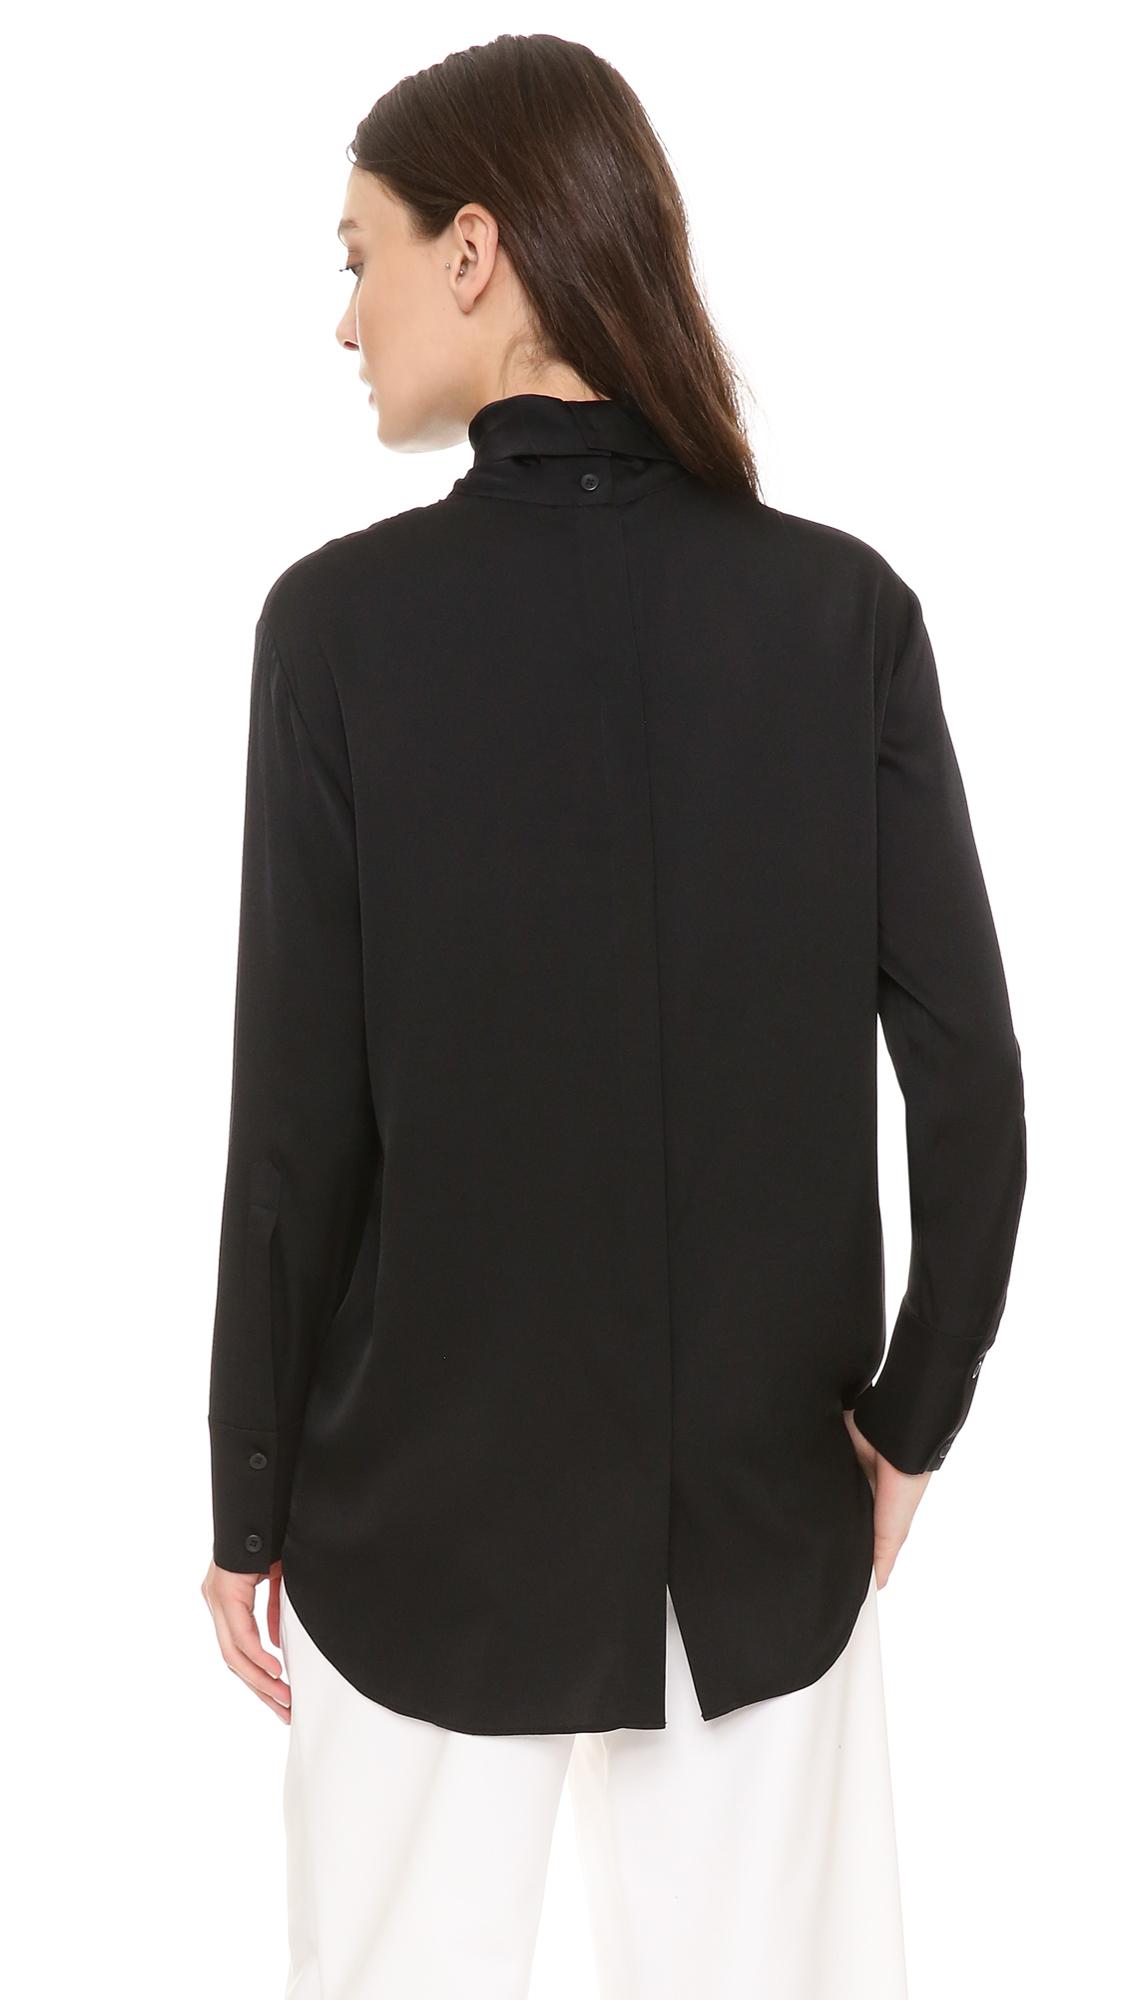 Dkny Long Sleeve Mock Neck Shirt In Black Lyst